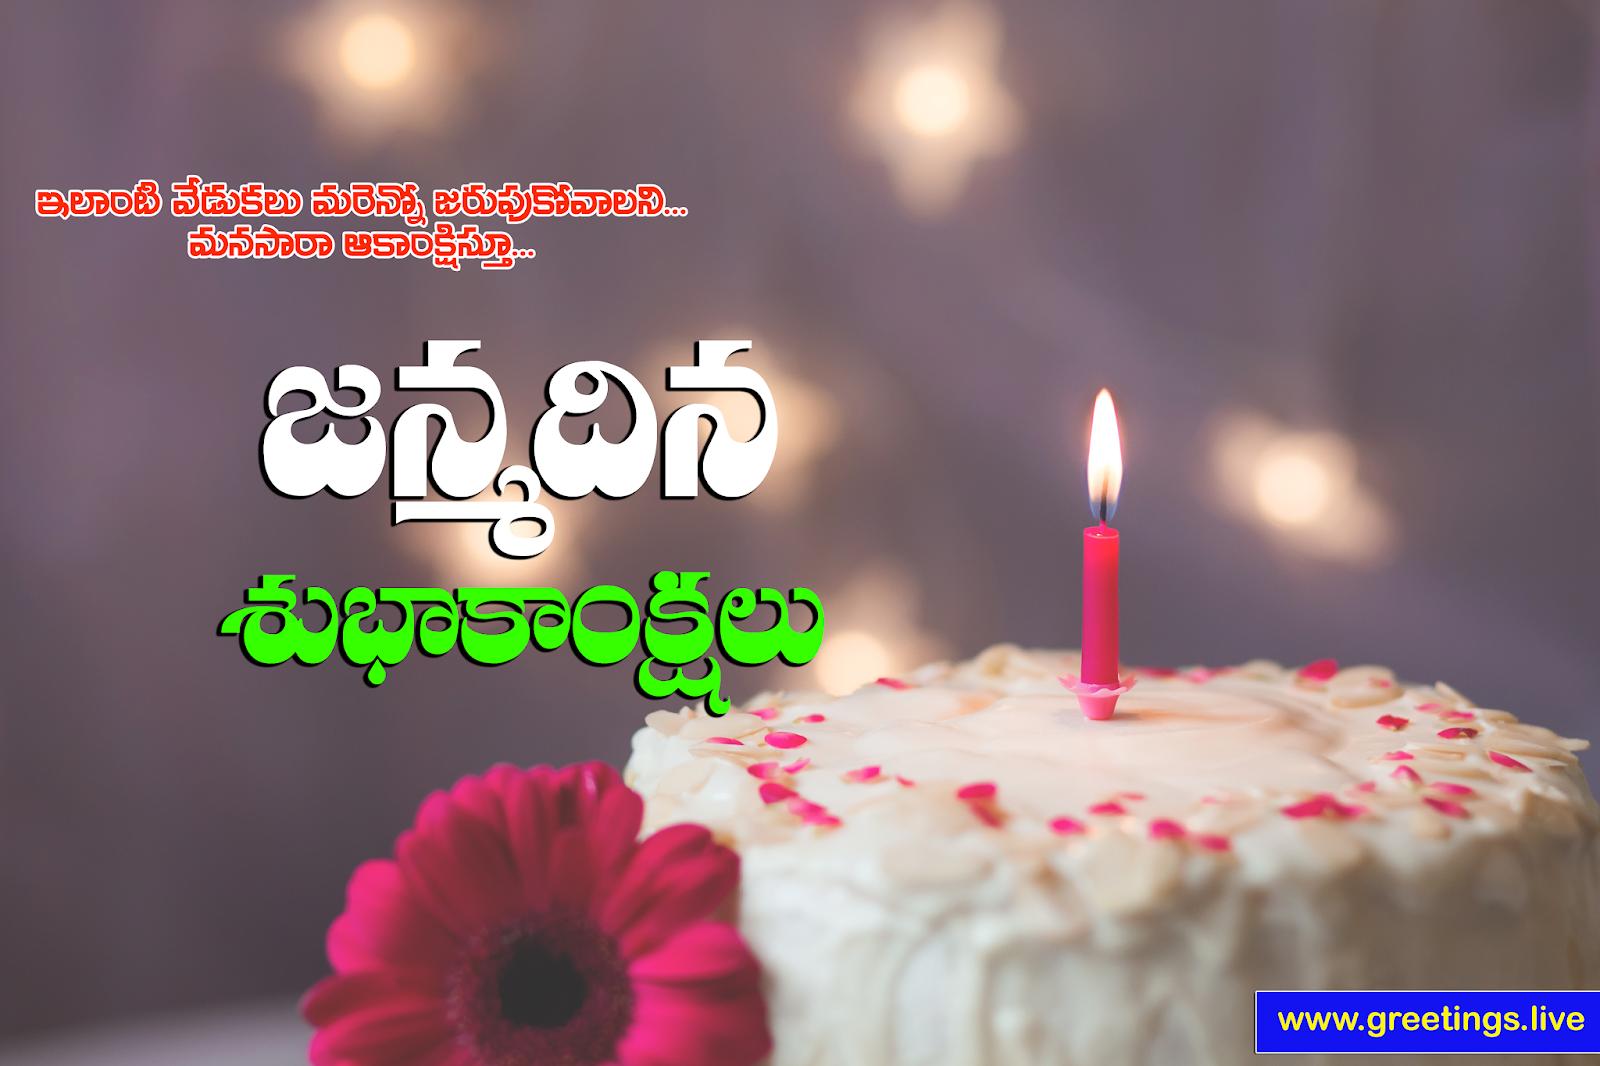 how to say happy birthday to my friend in telugu quora